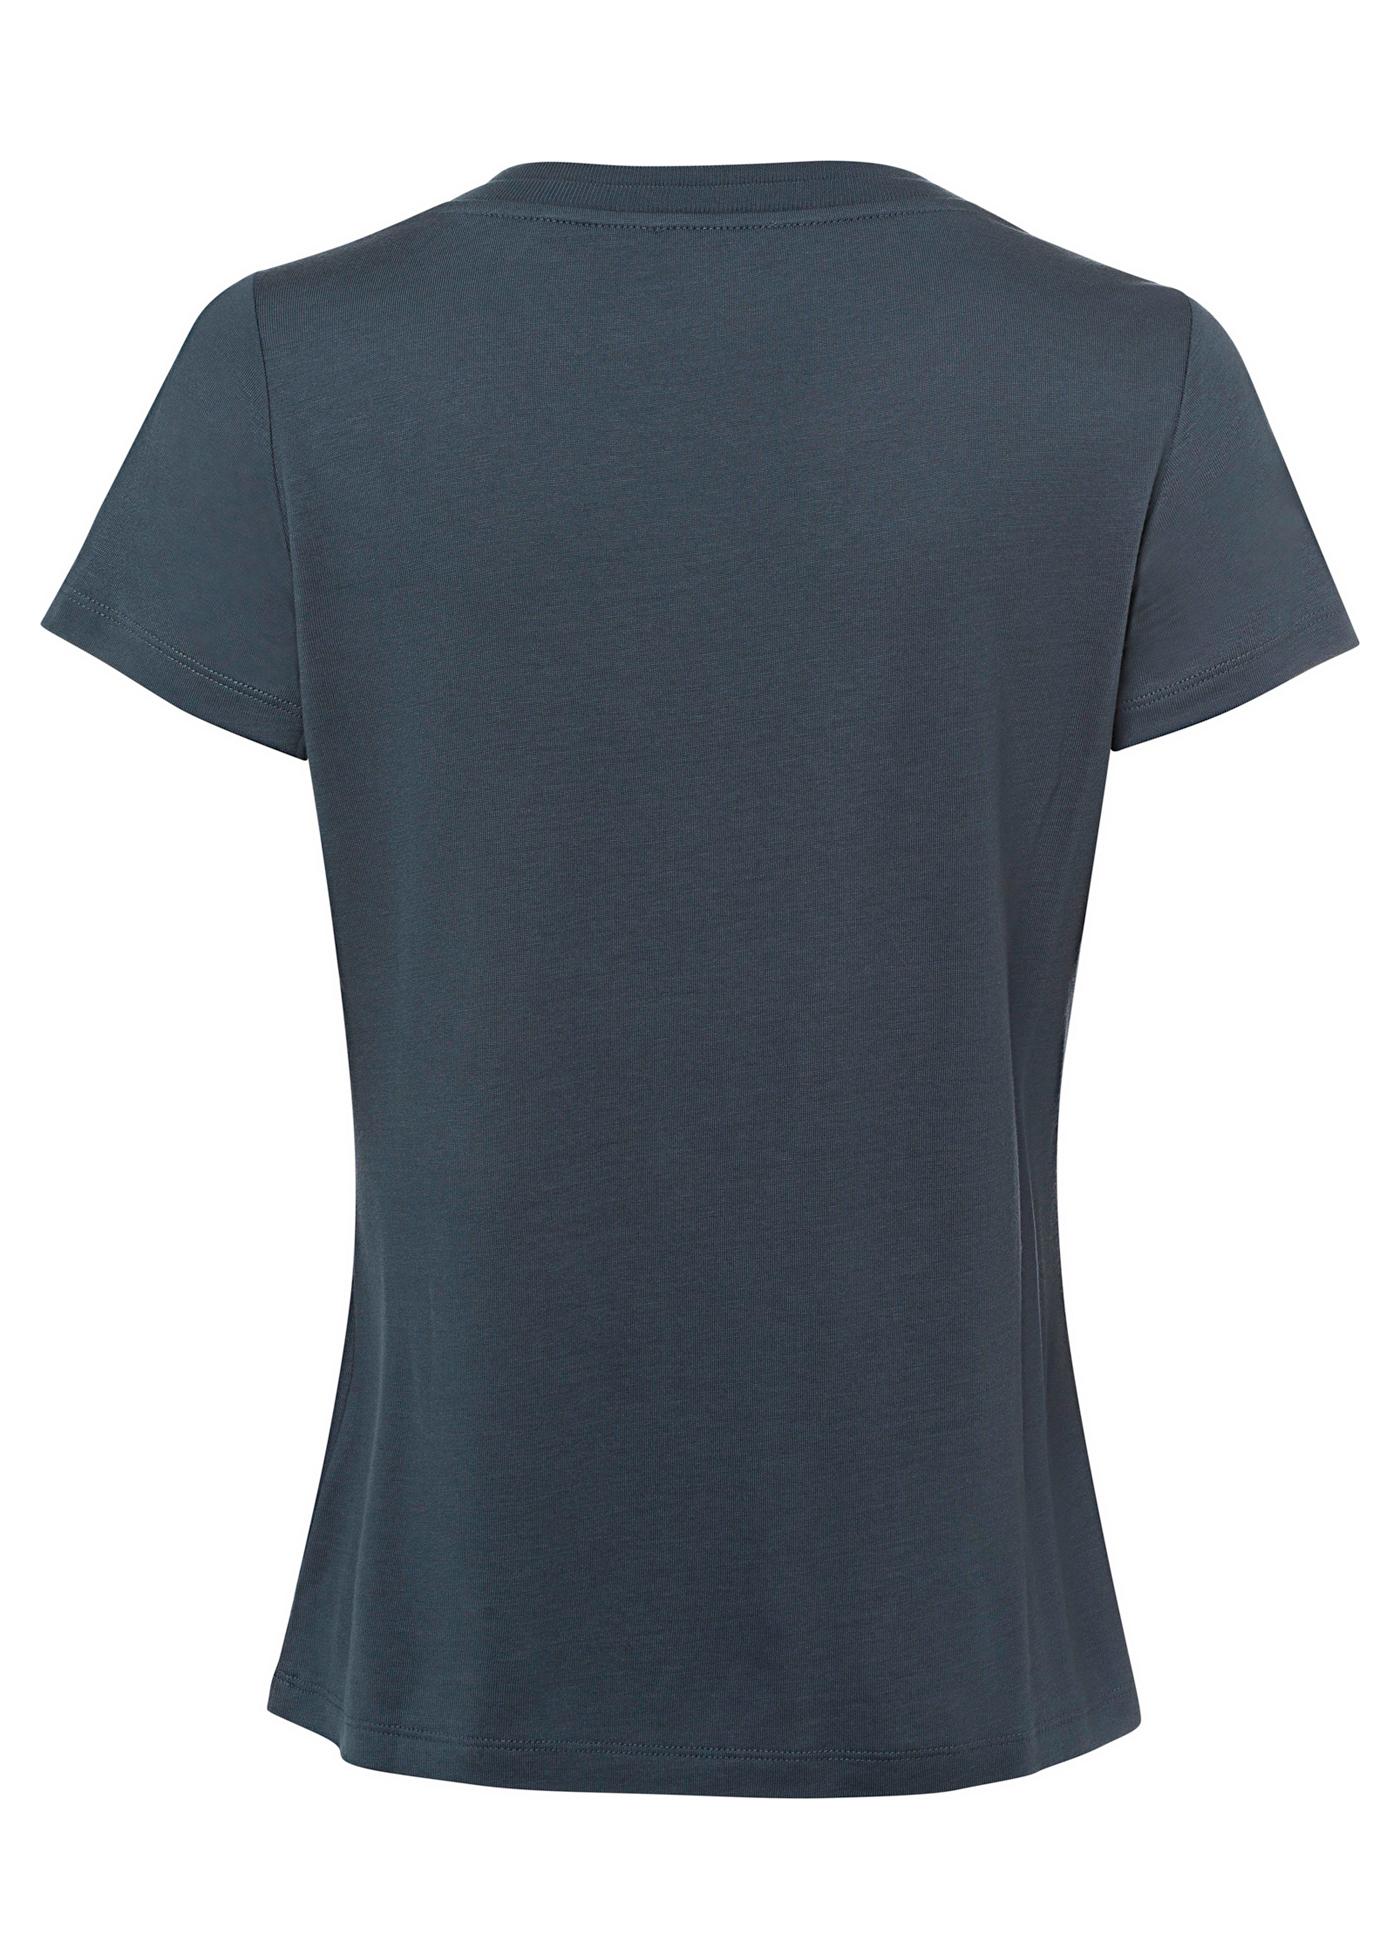 Shirt mit Arm image number 1